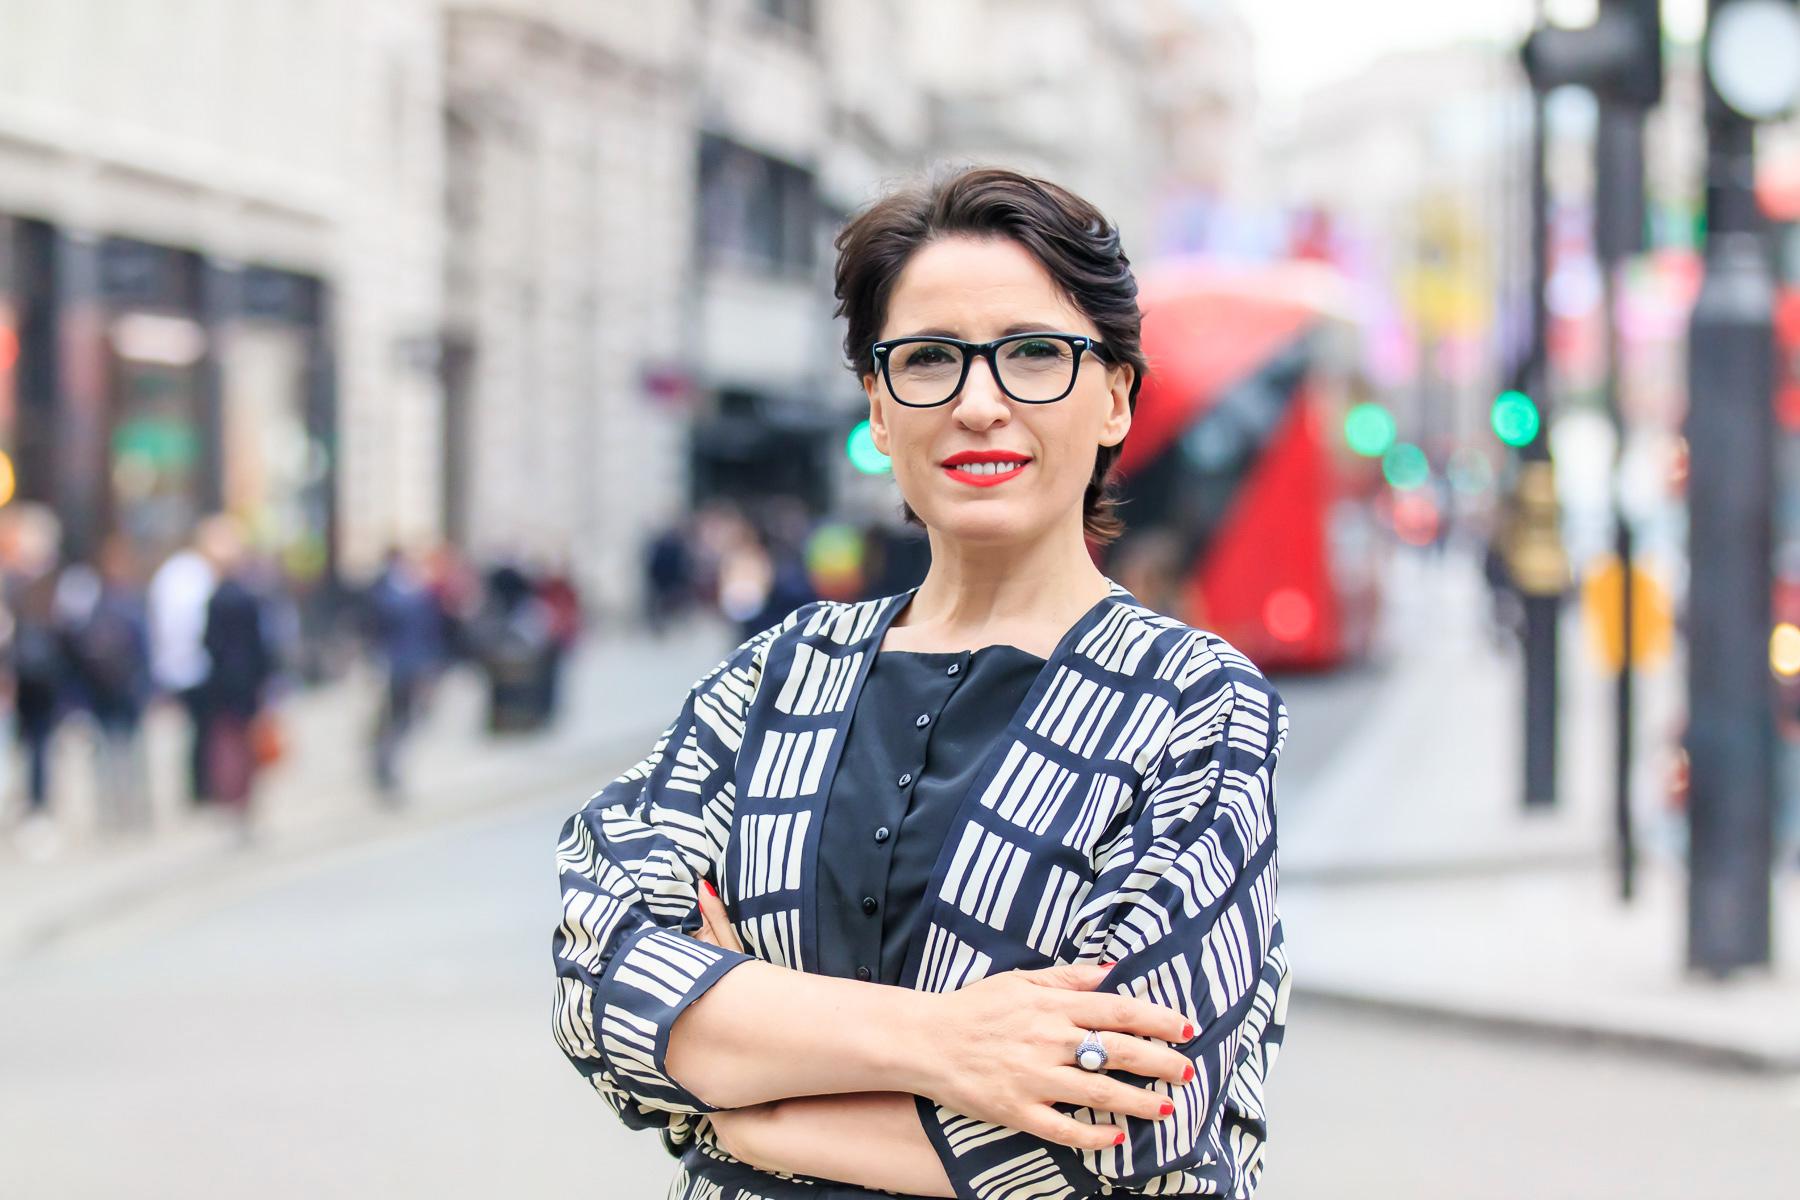 Business Portraits by Andreea Tufescu Photography - Business Women - Global Woman founder Mirela Sula